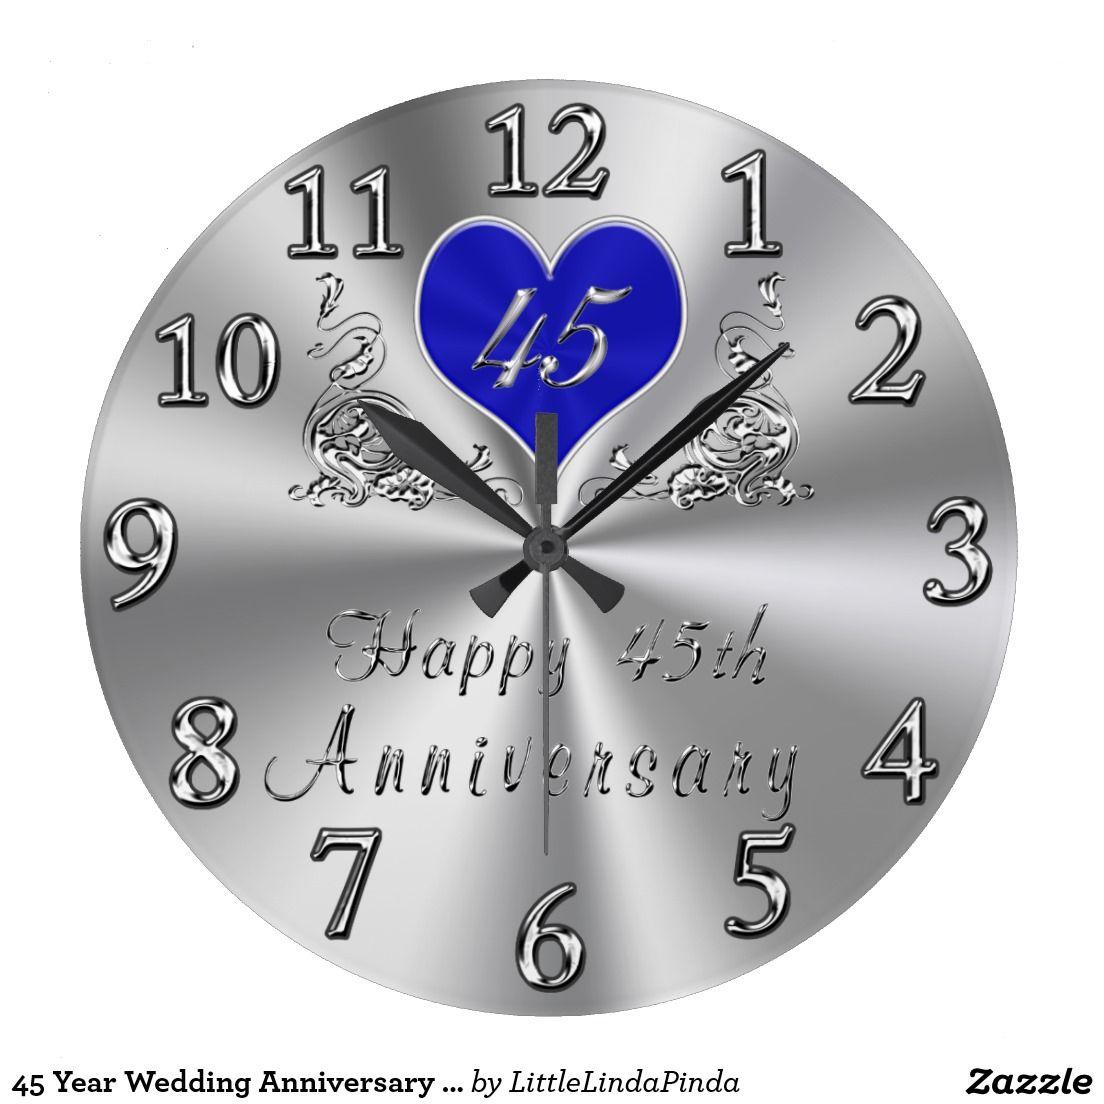 45 Wedding Anniversary Gift Ideas: 45 Year Wedding Anniversary Gifts Sapphire CLOCK